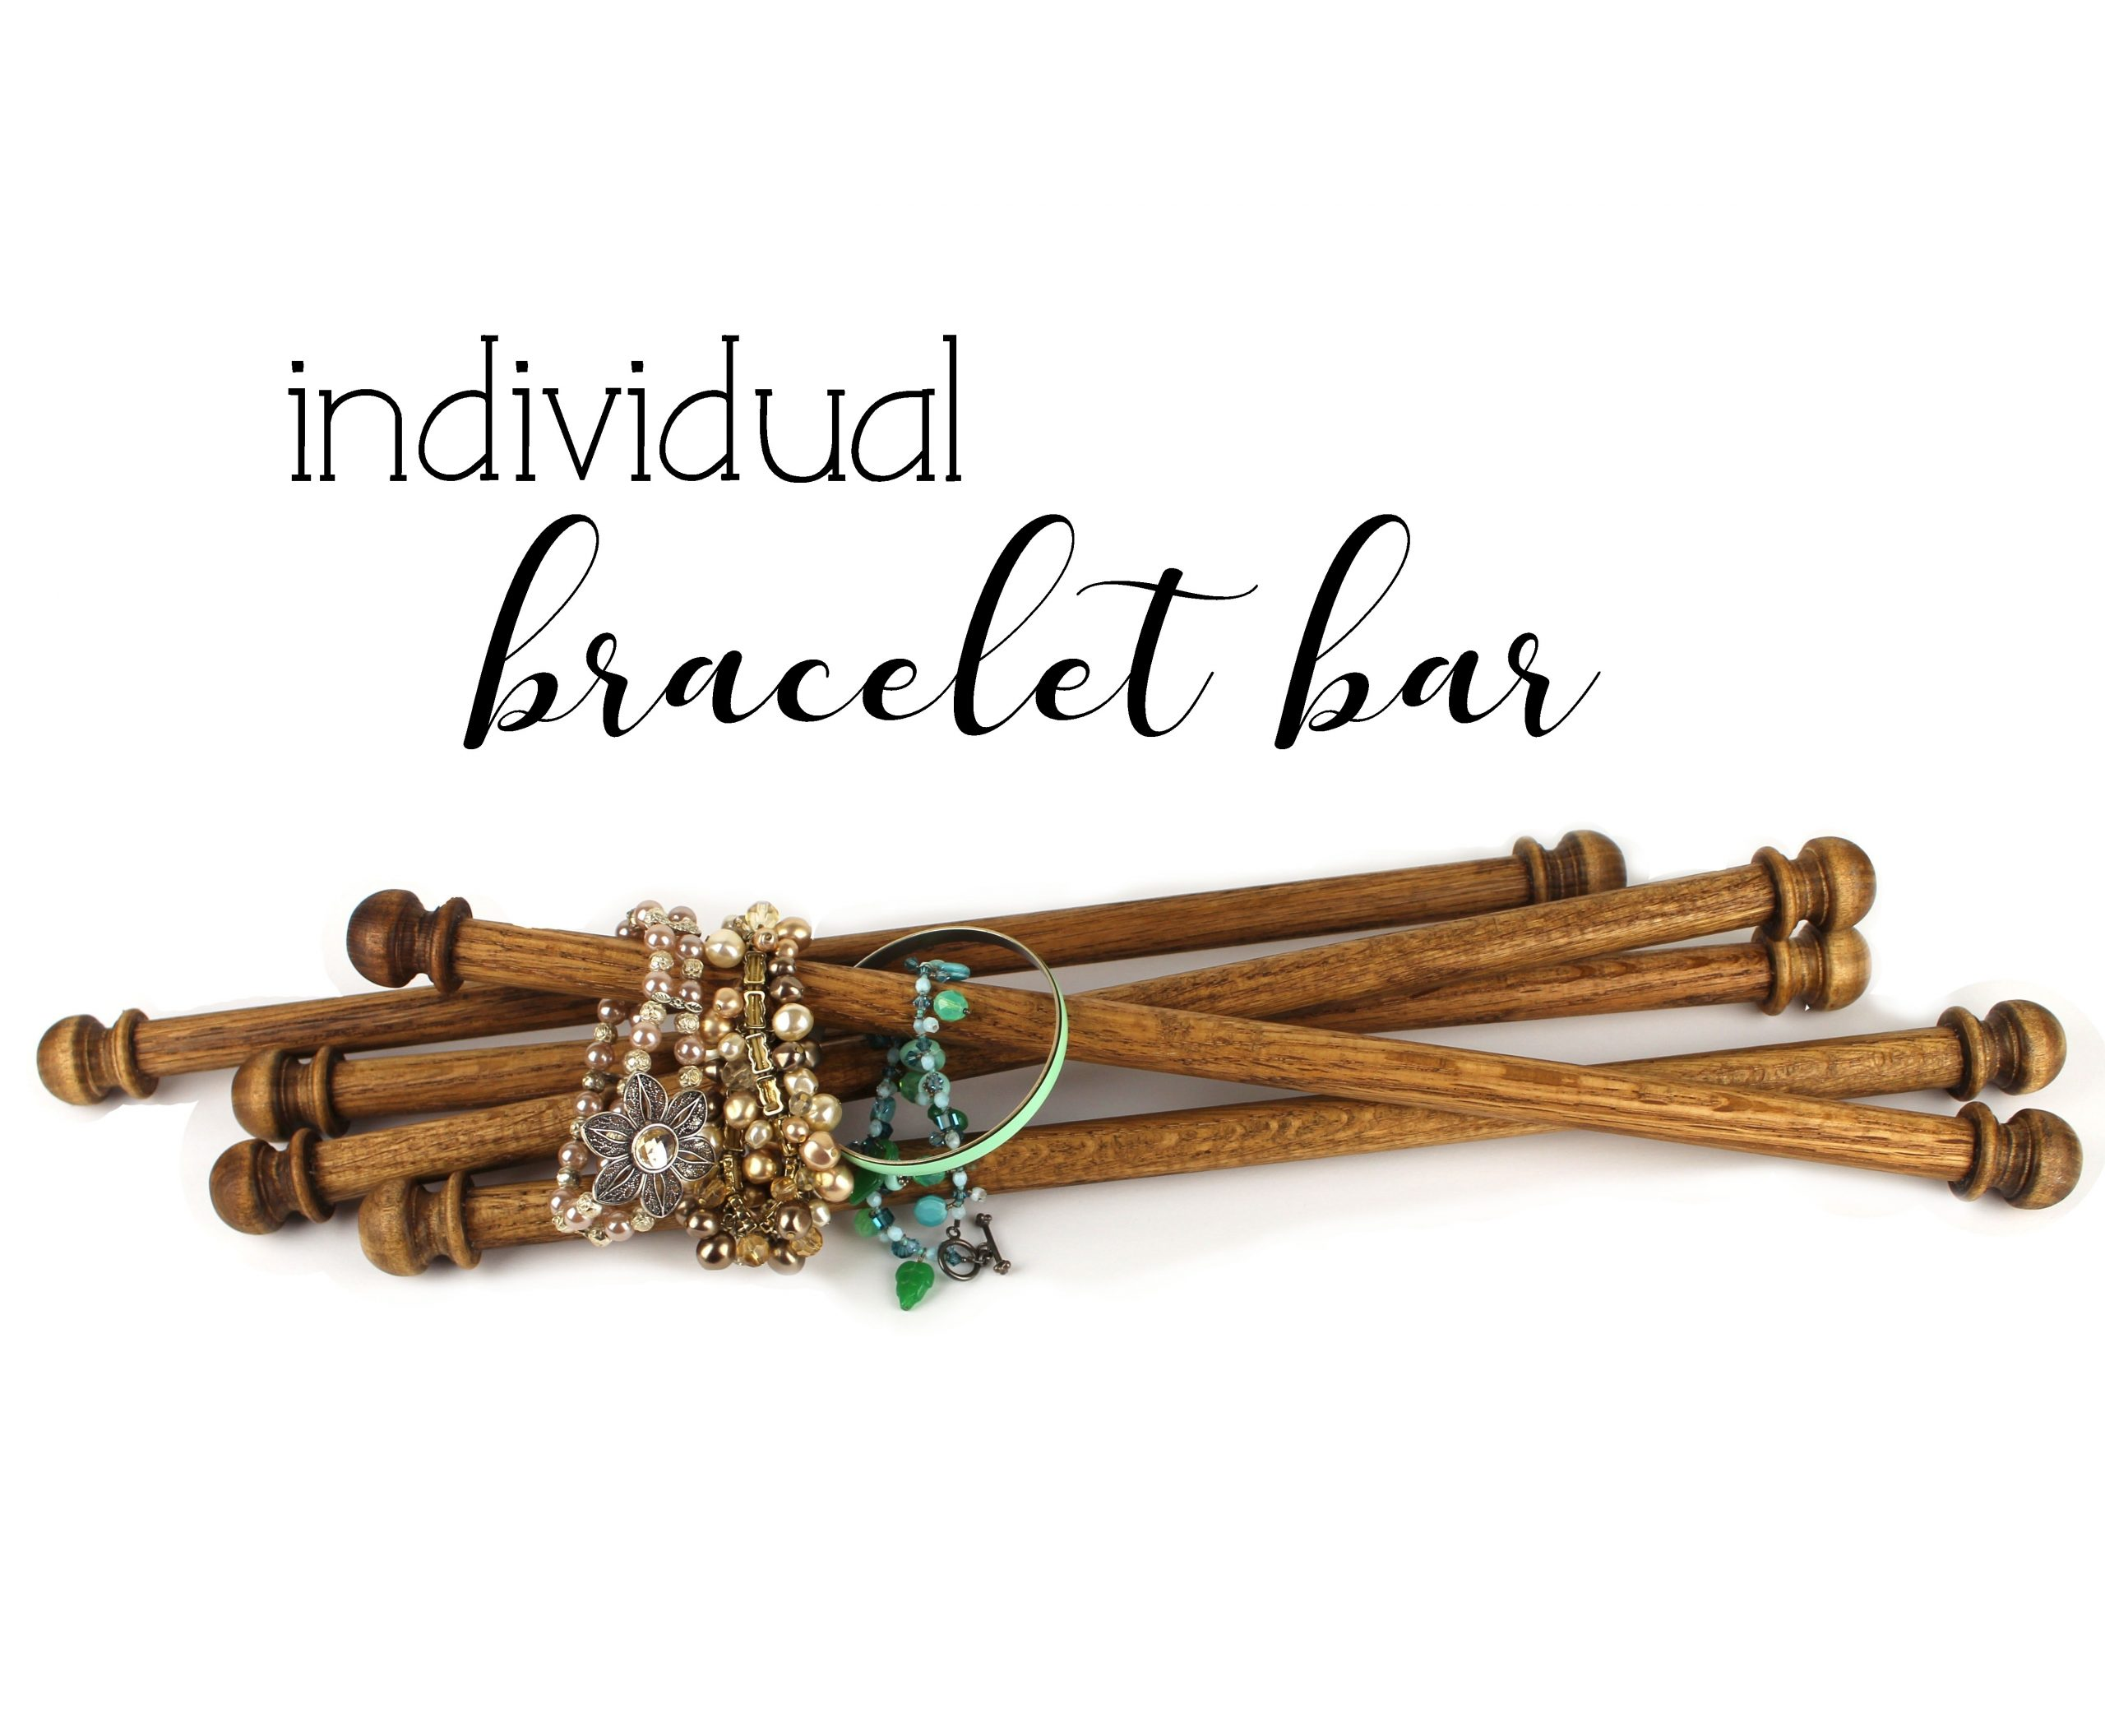 wood bracelet bar